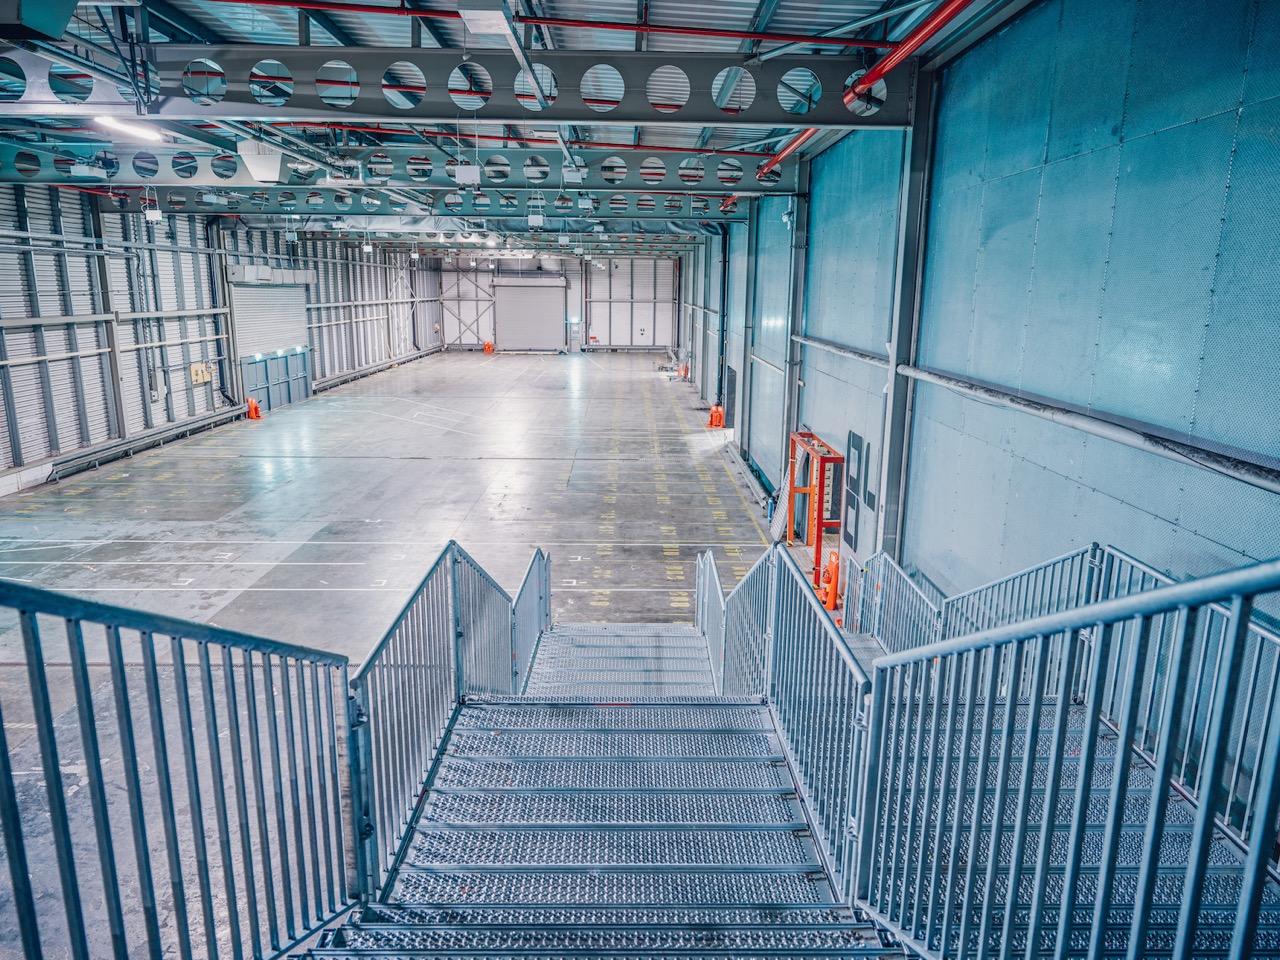 Locations: The Printworks. Zone: Reel Storage